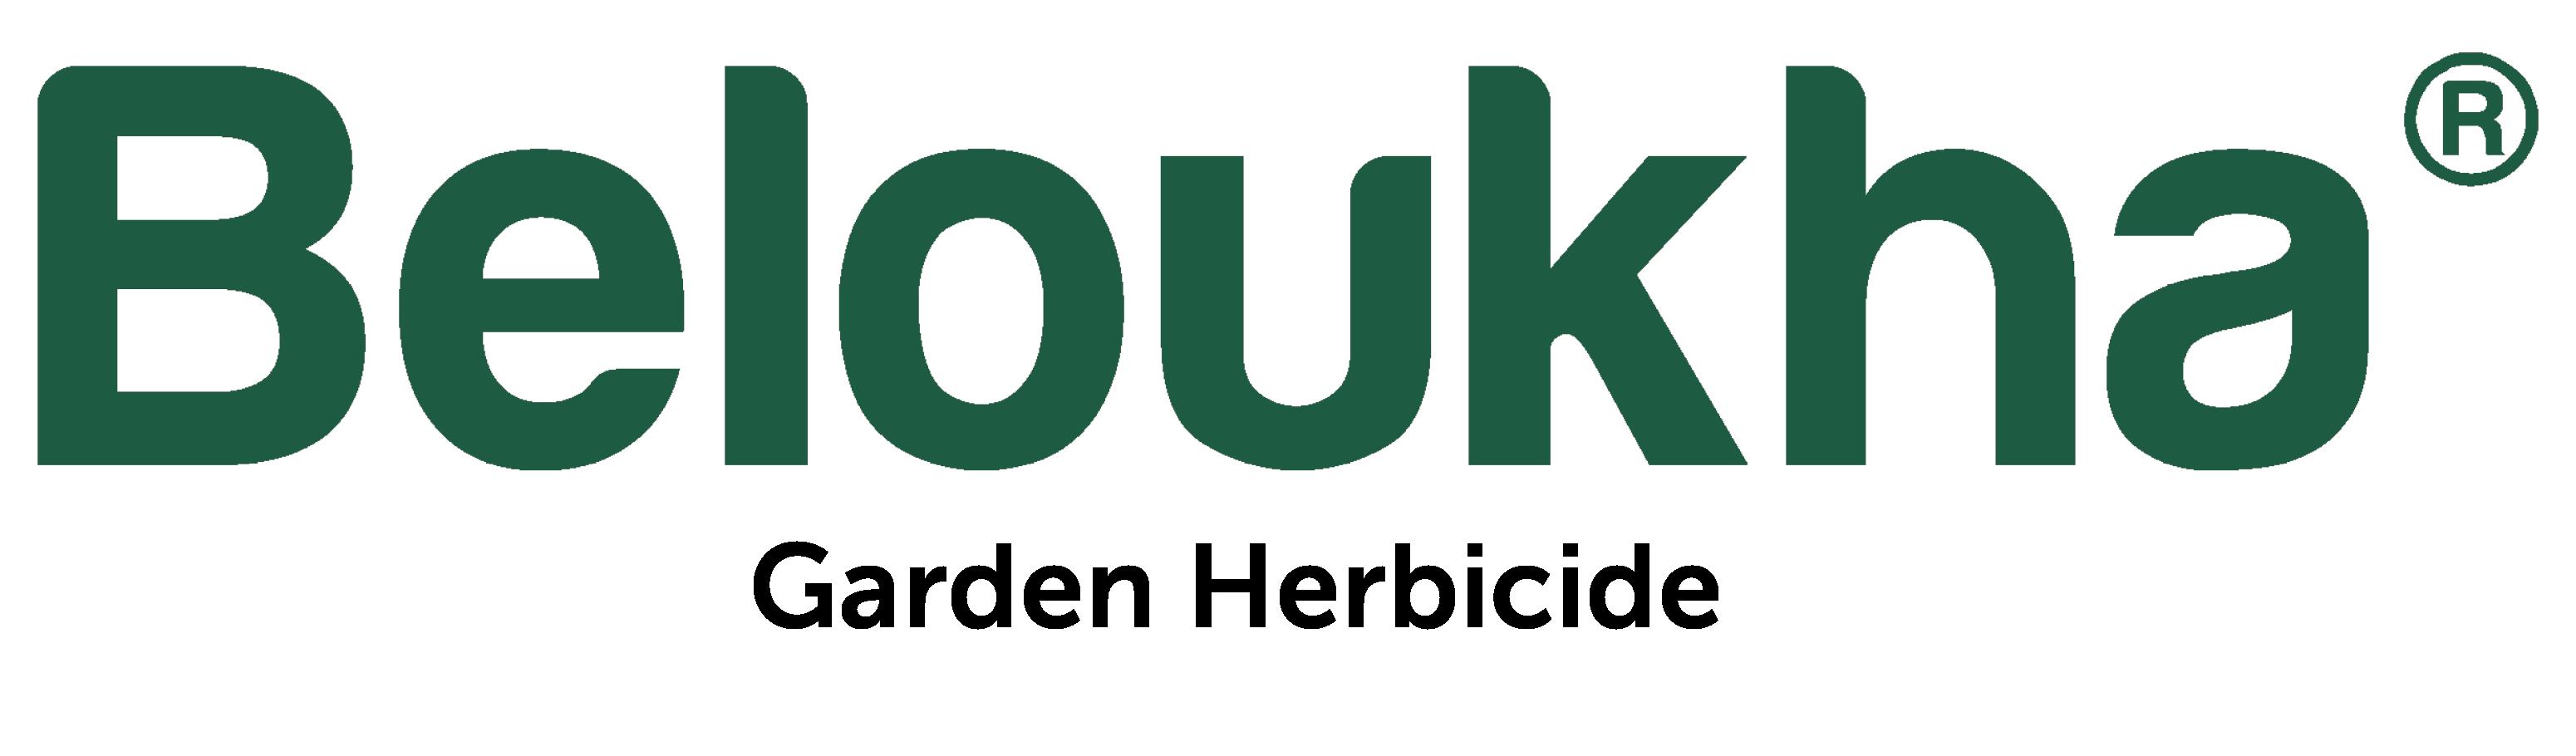 Beloukha® Garden Herbicide logo